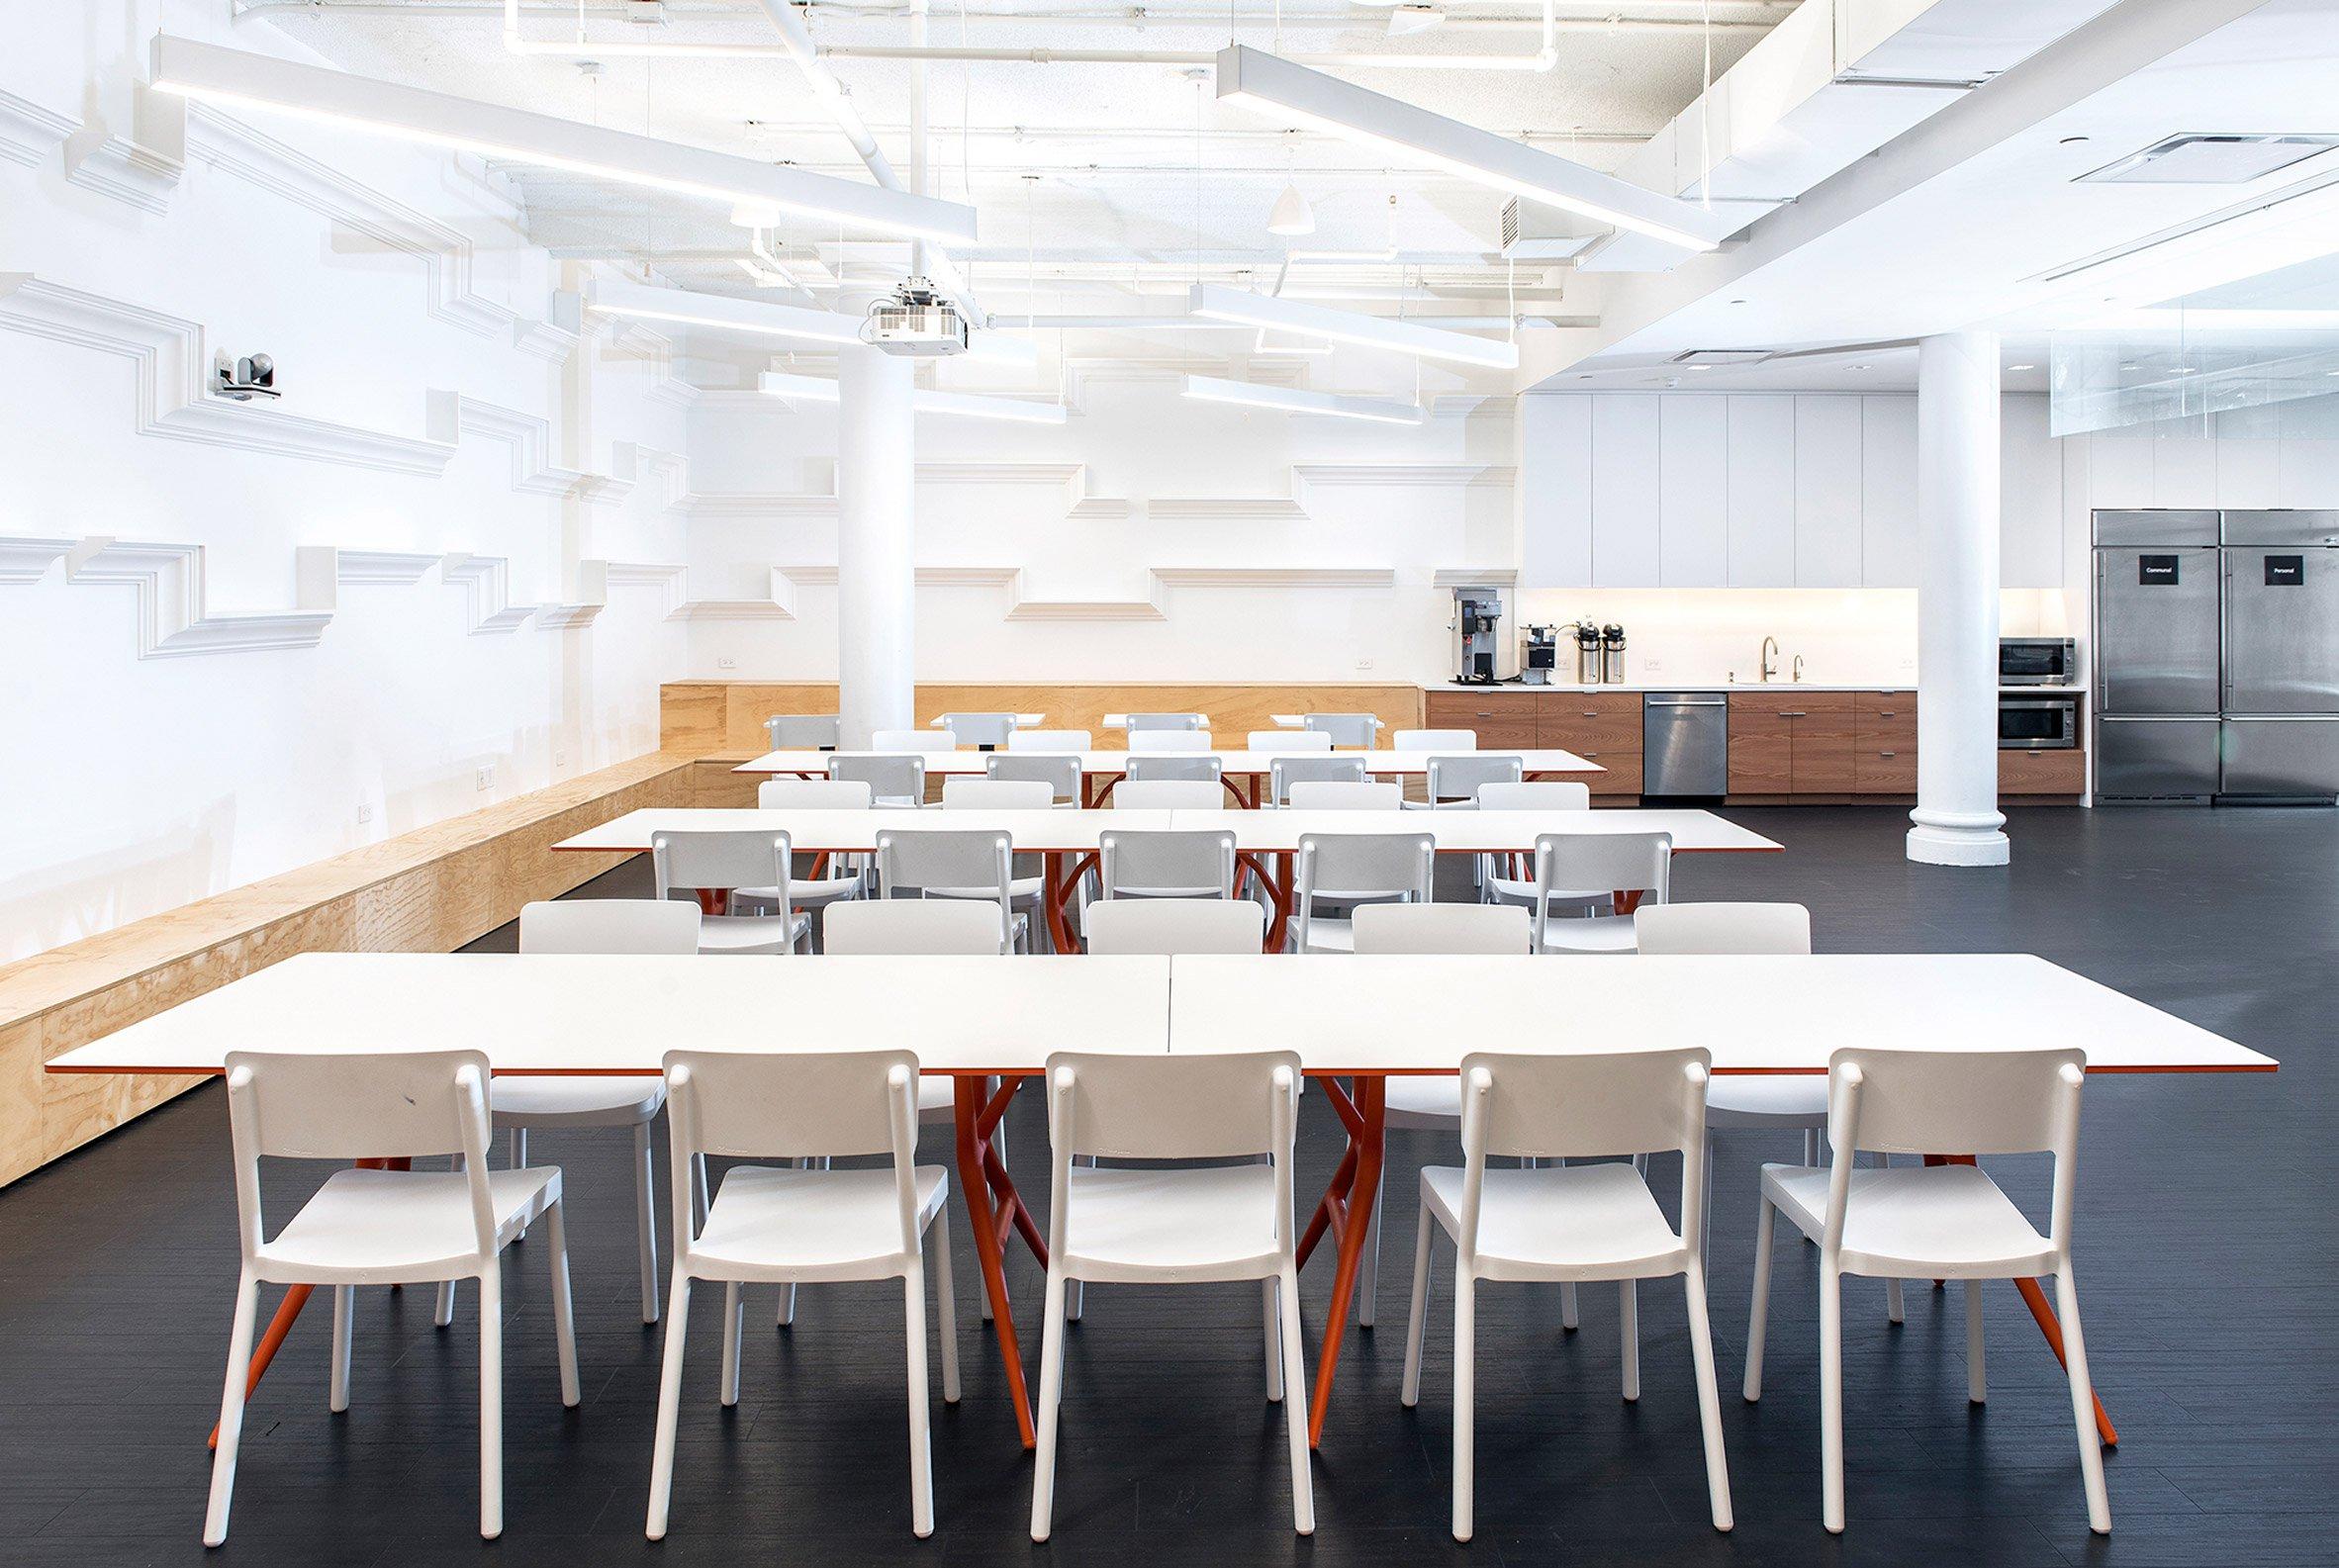 architecture-interiors-offices- manhatten-new-york-design-studia-osnovadesign-osnova-poltava_18